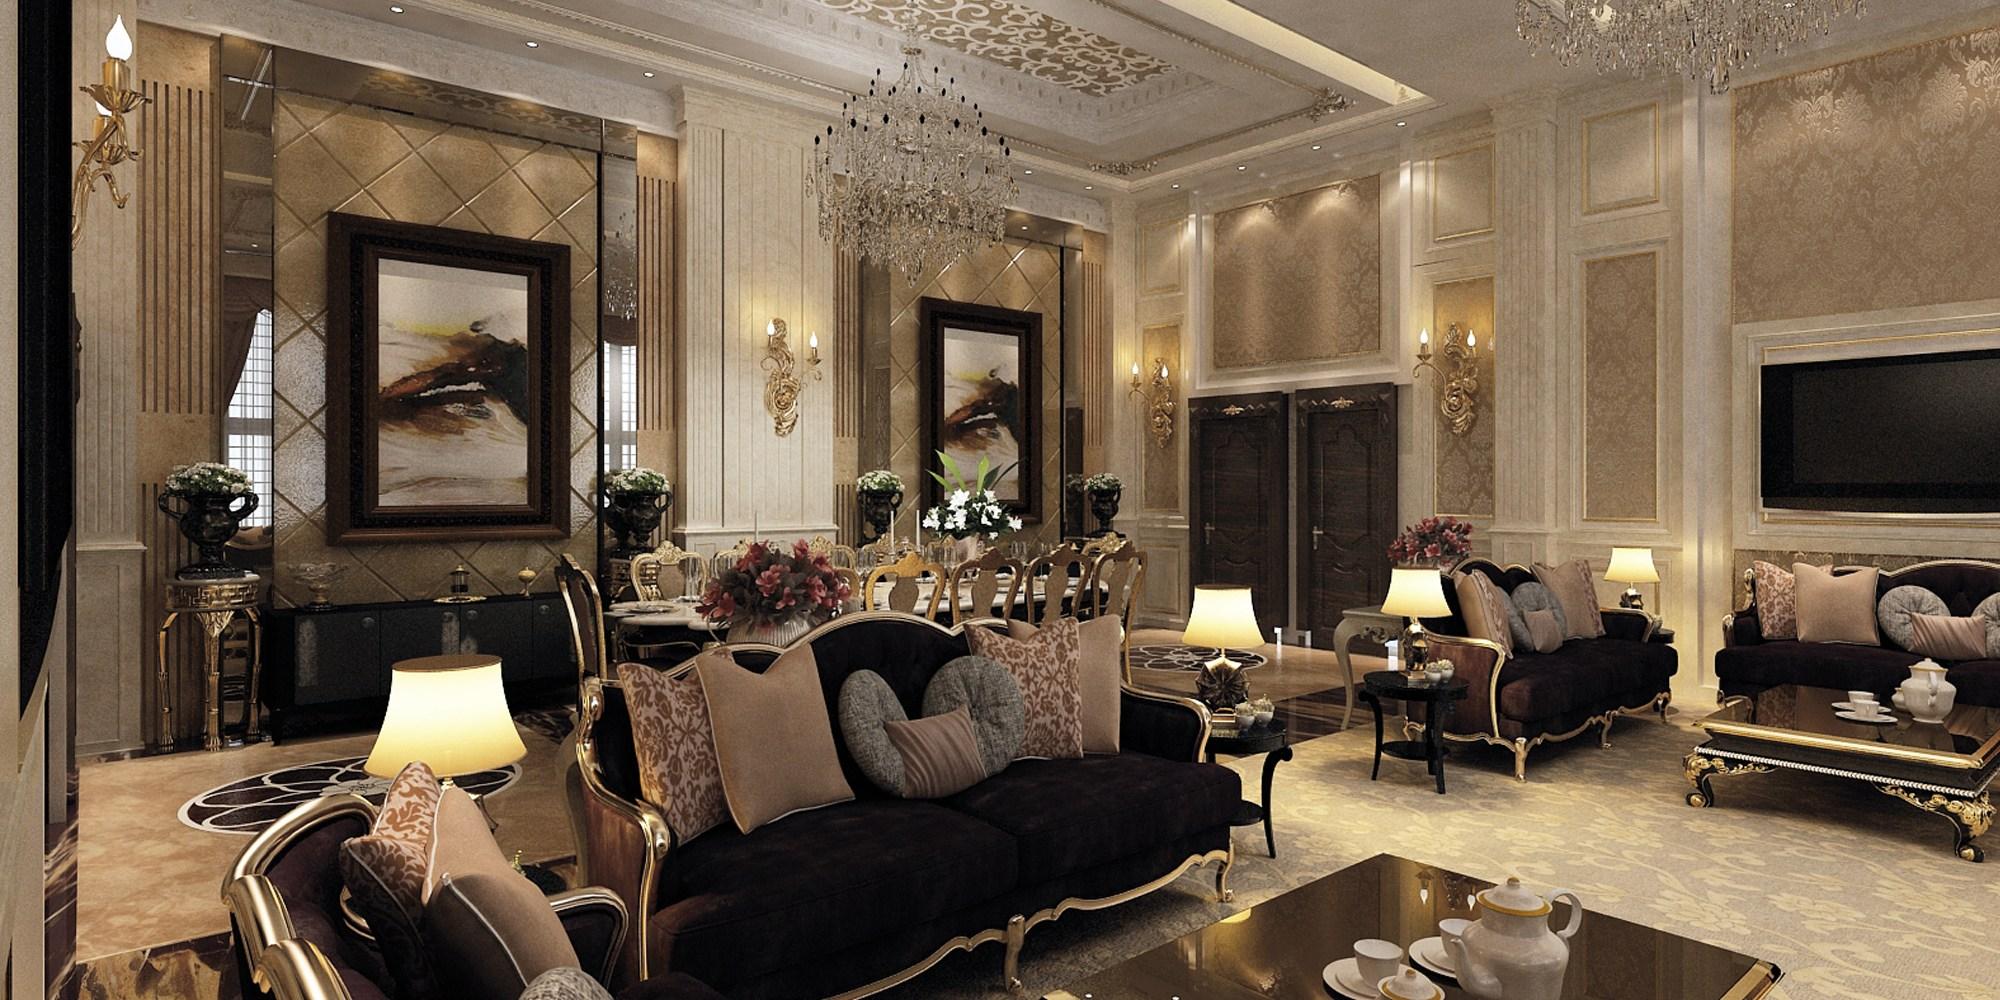 <p>Hotel Crown Plaza</p>